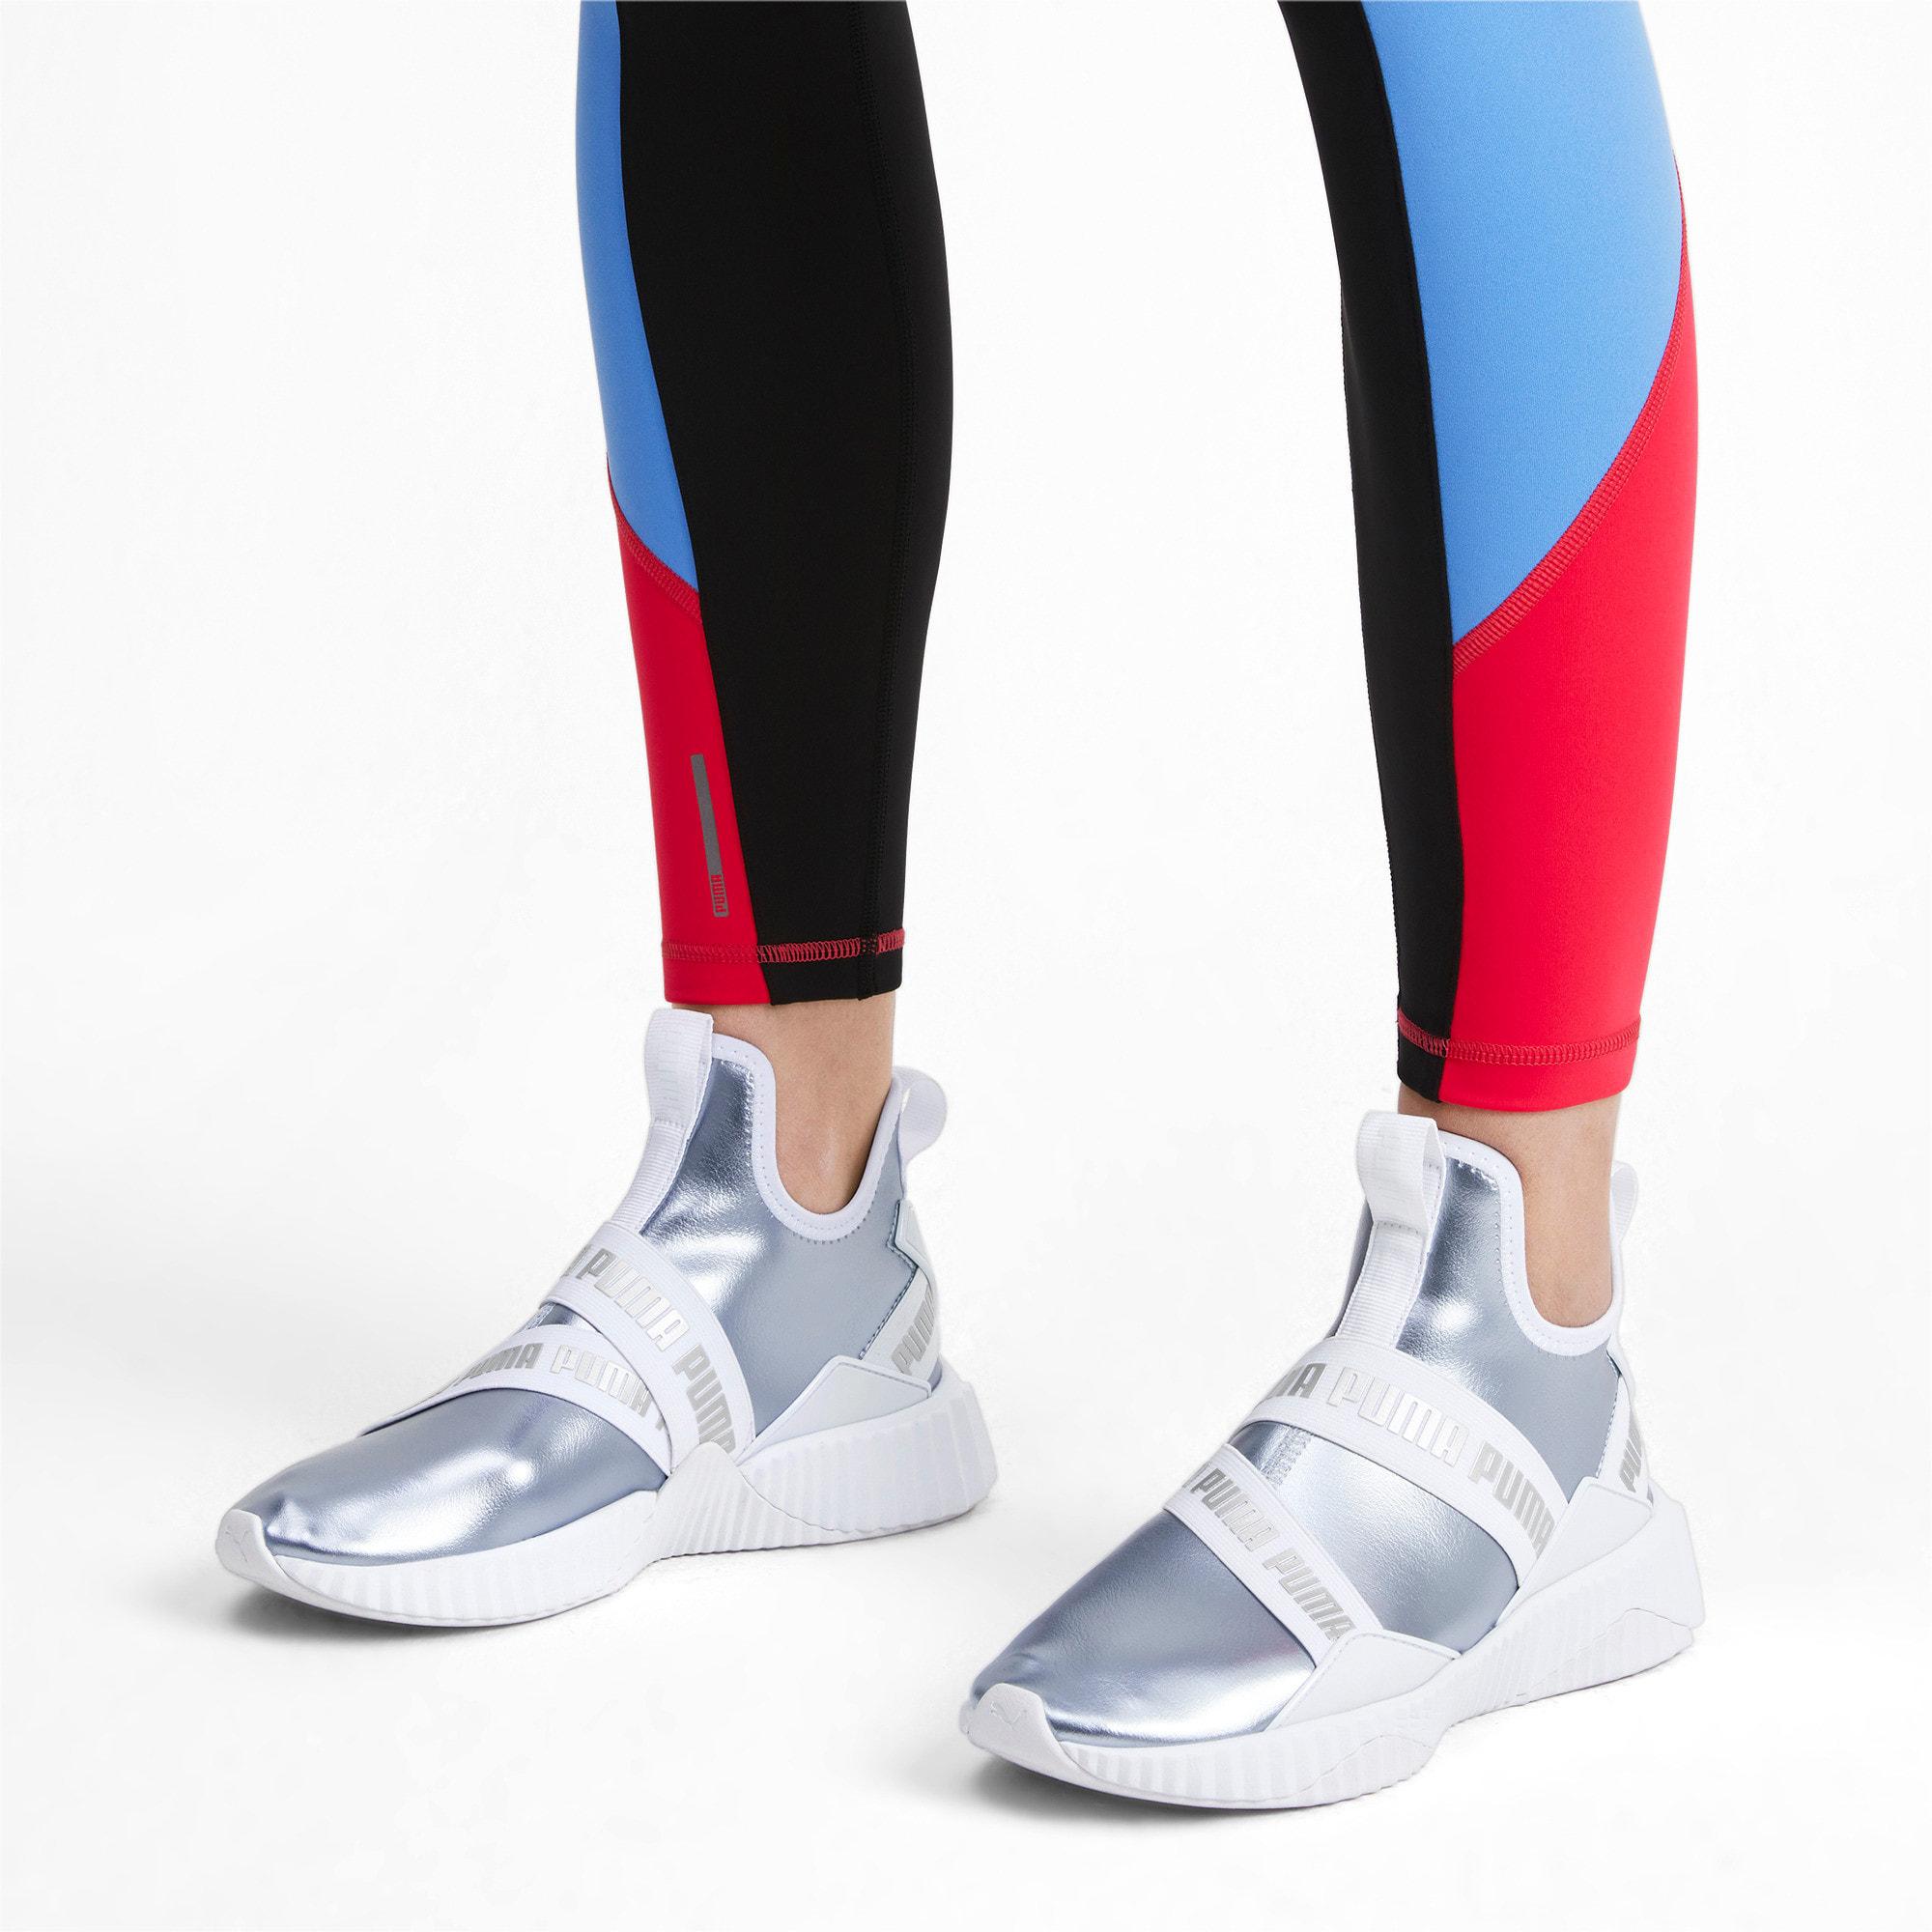 Thumbnail 3 of Defy Mid Metallic Women's Training Shoes, Heather-Puma White, medium